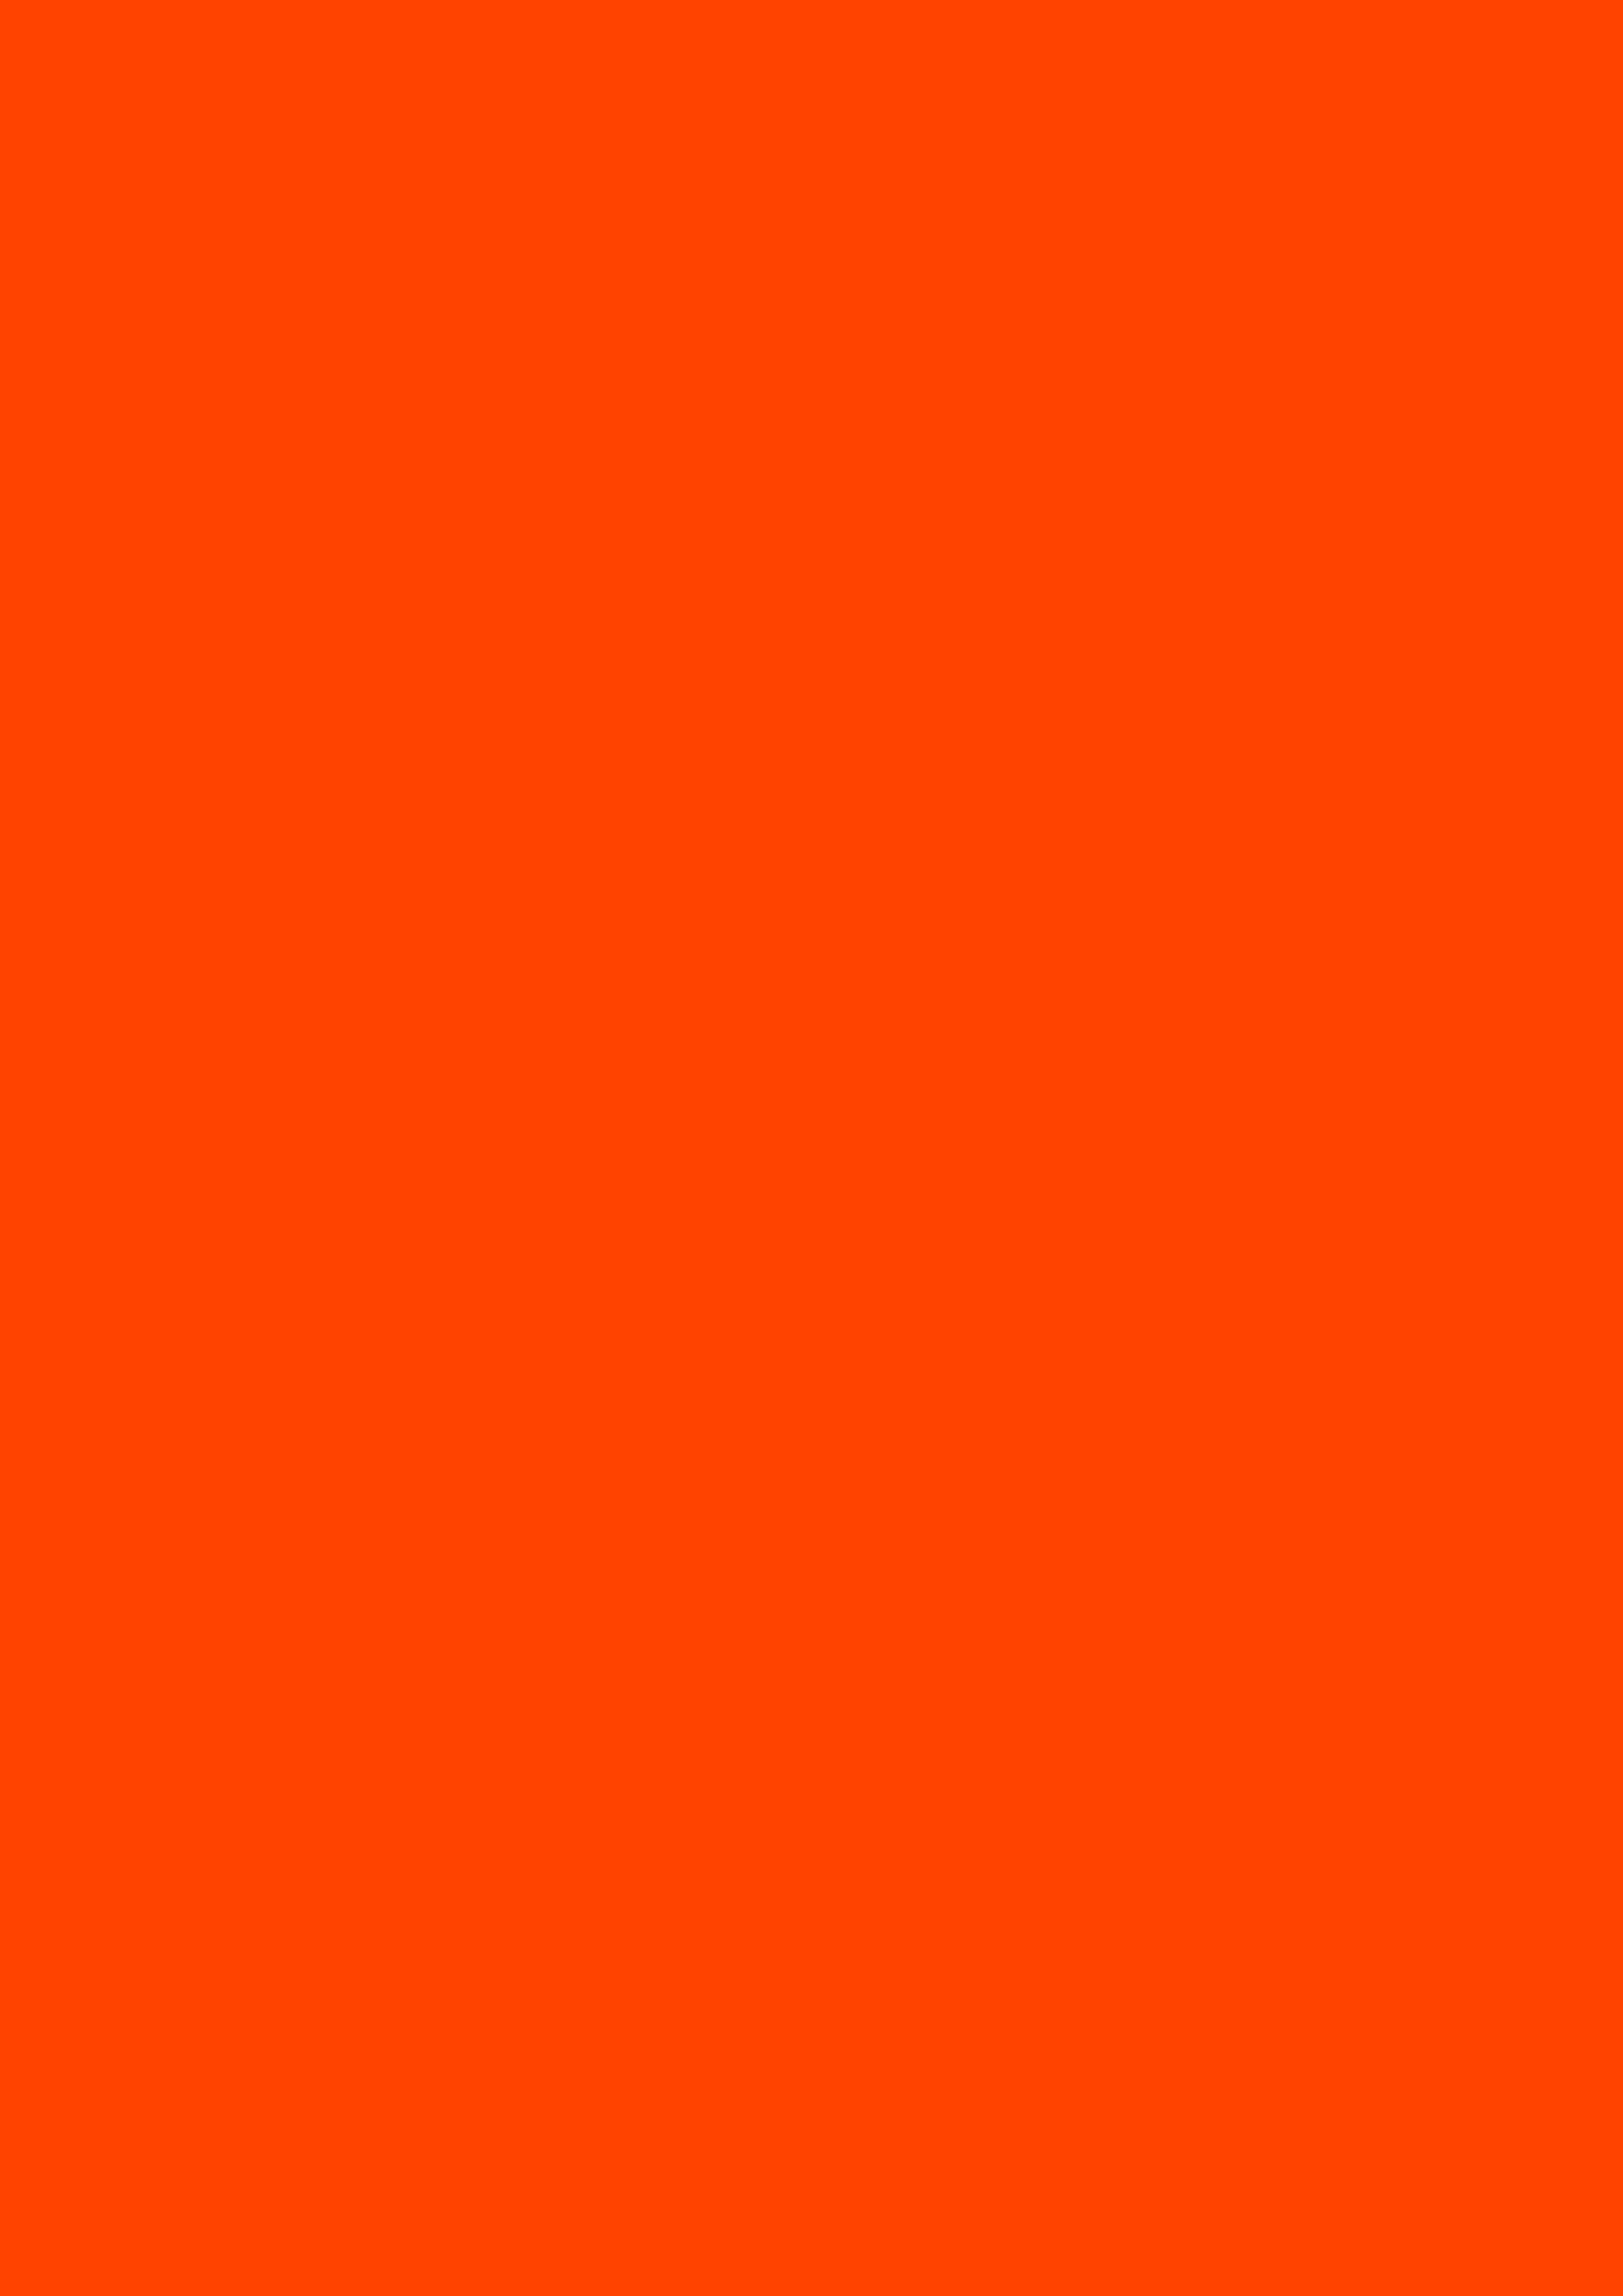 2480x3508 Orange-red Solid Color Background